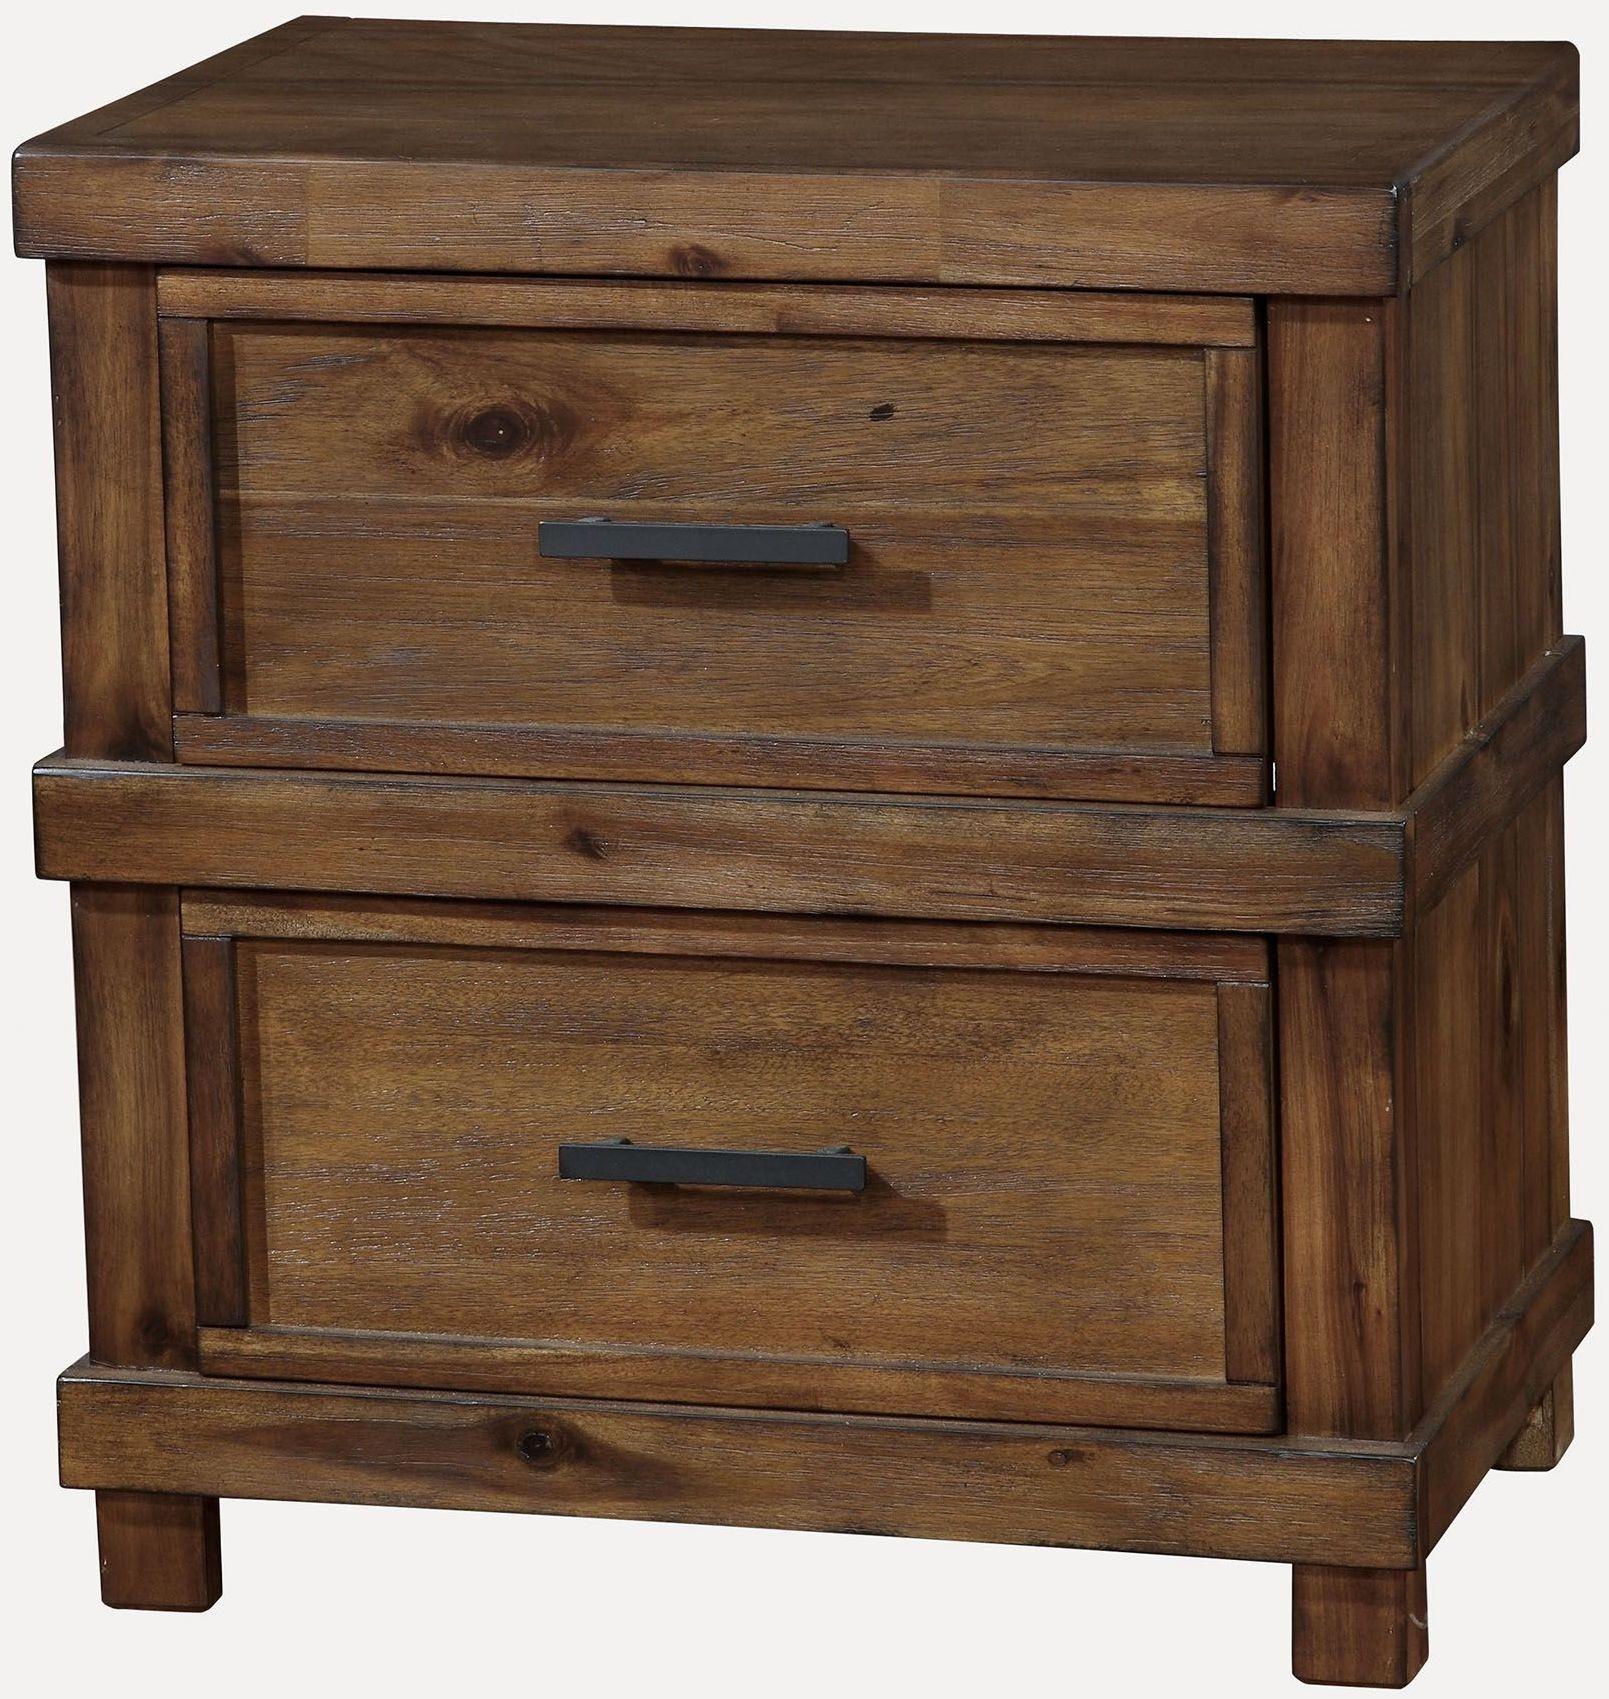 Baddock Antique Oak Panel Bedroom Set, CM7691Q, Furniture